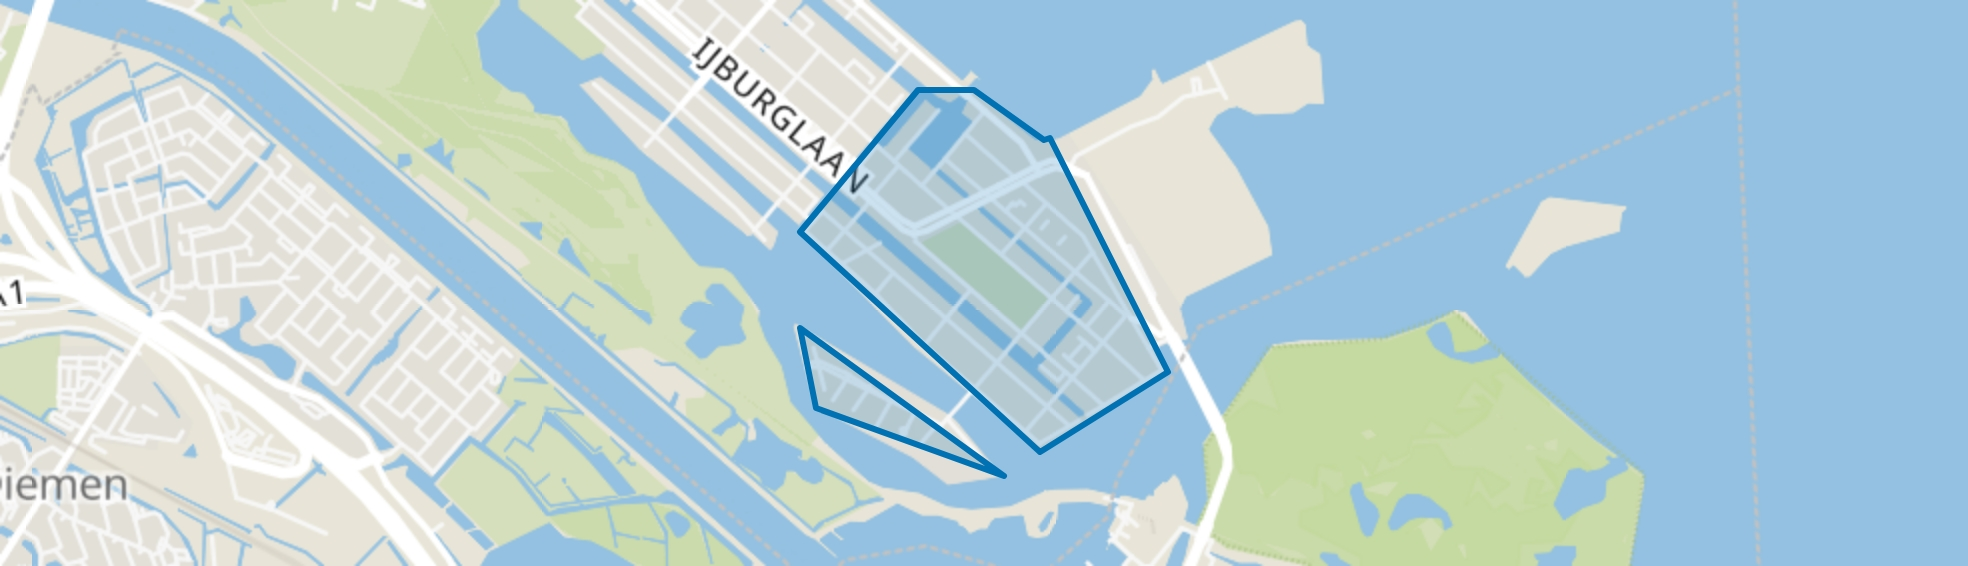 IJburg Zuid, Amsterdam map